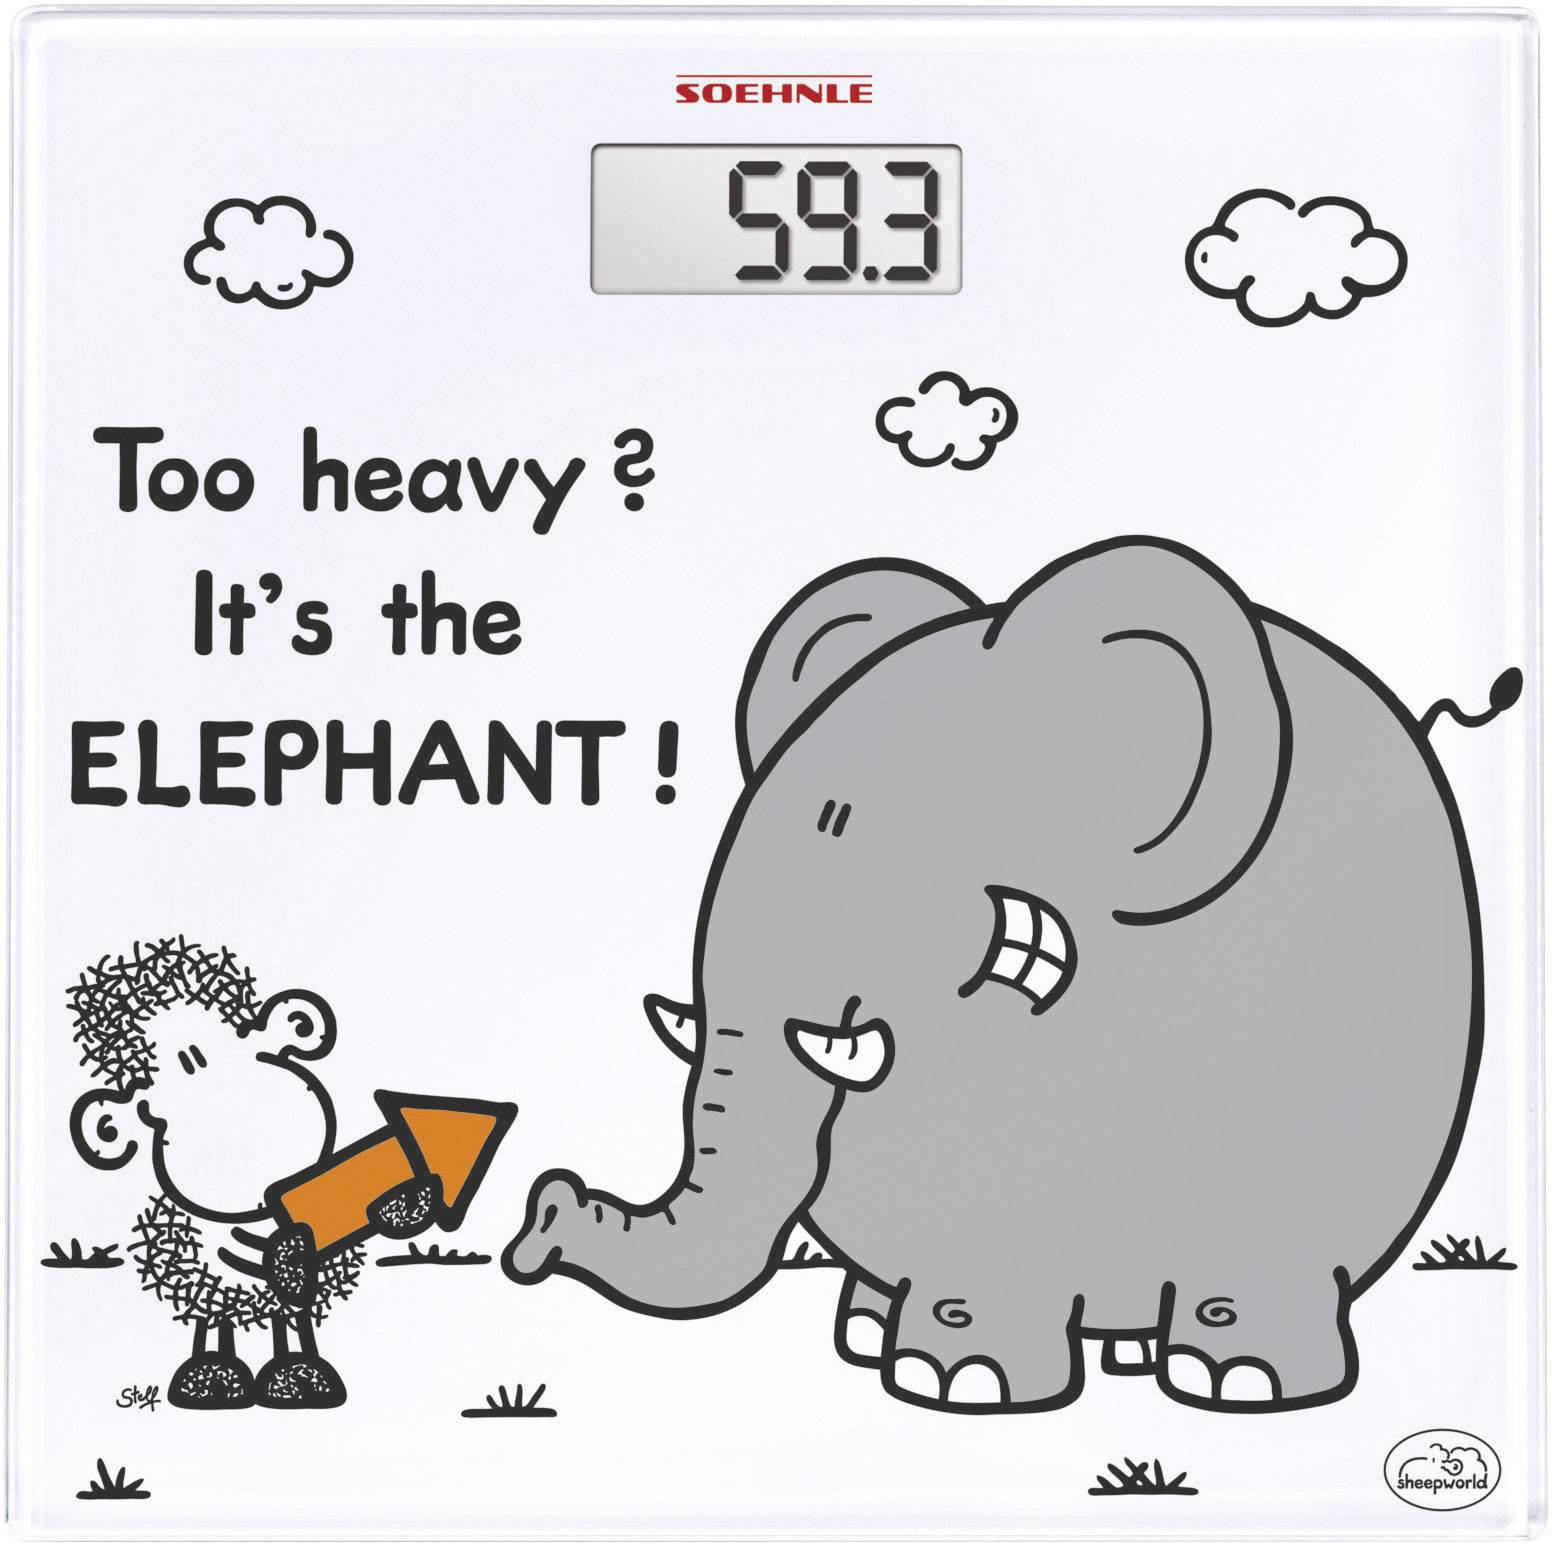 Digitálna osobná váha Soehnle Sheepworld too heavy, biela